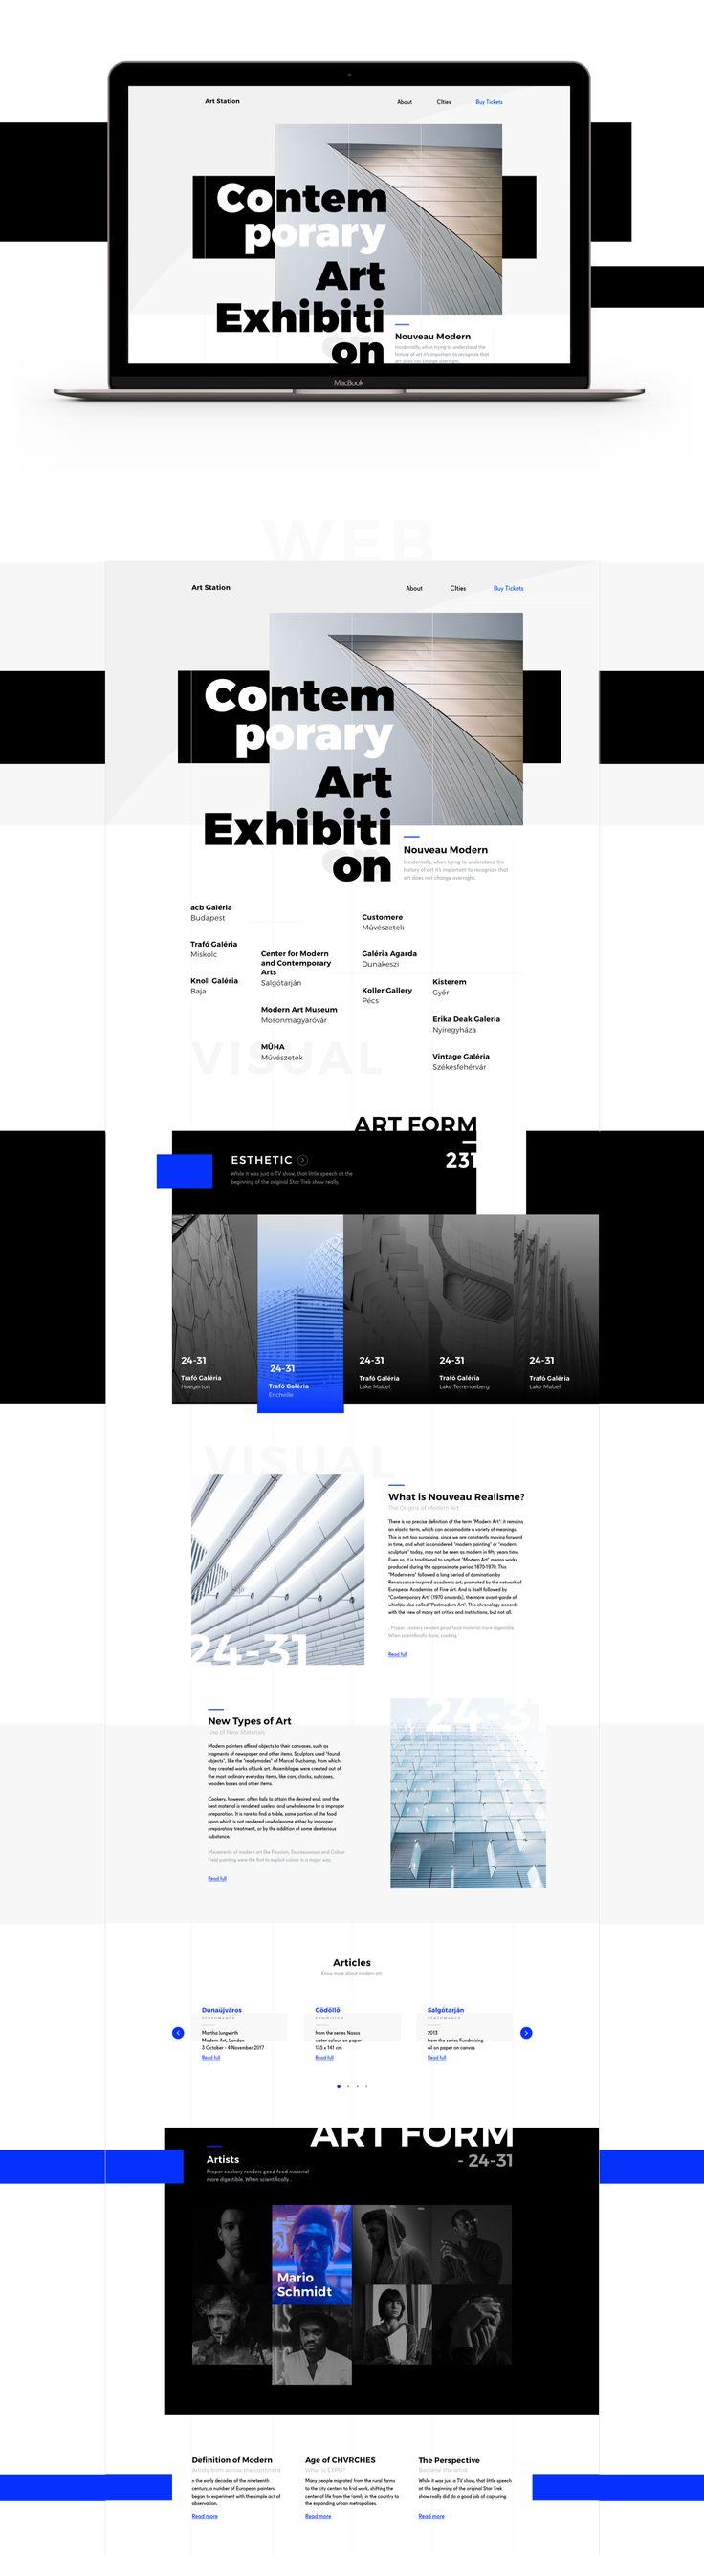 Website for Art Exhibition in Hungary  Full project on Behance: https://vk.com/away.php?utf=1&to=https%3A%2F%2Fwww.behance.net%2Fvov9166593